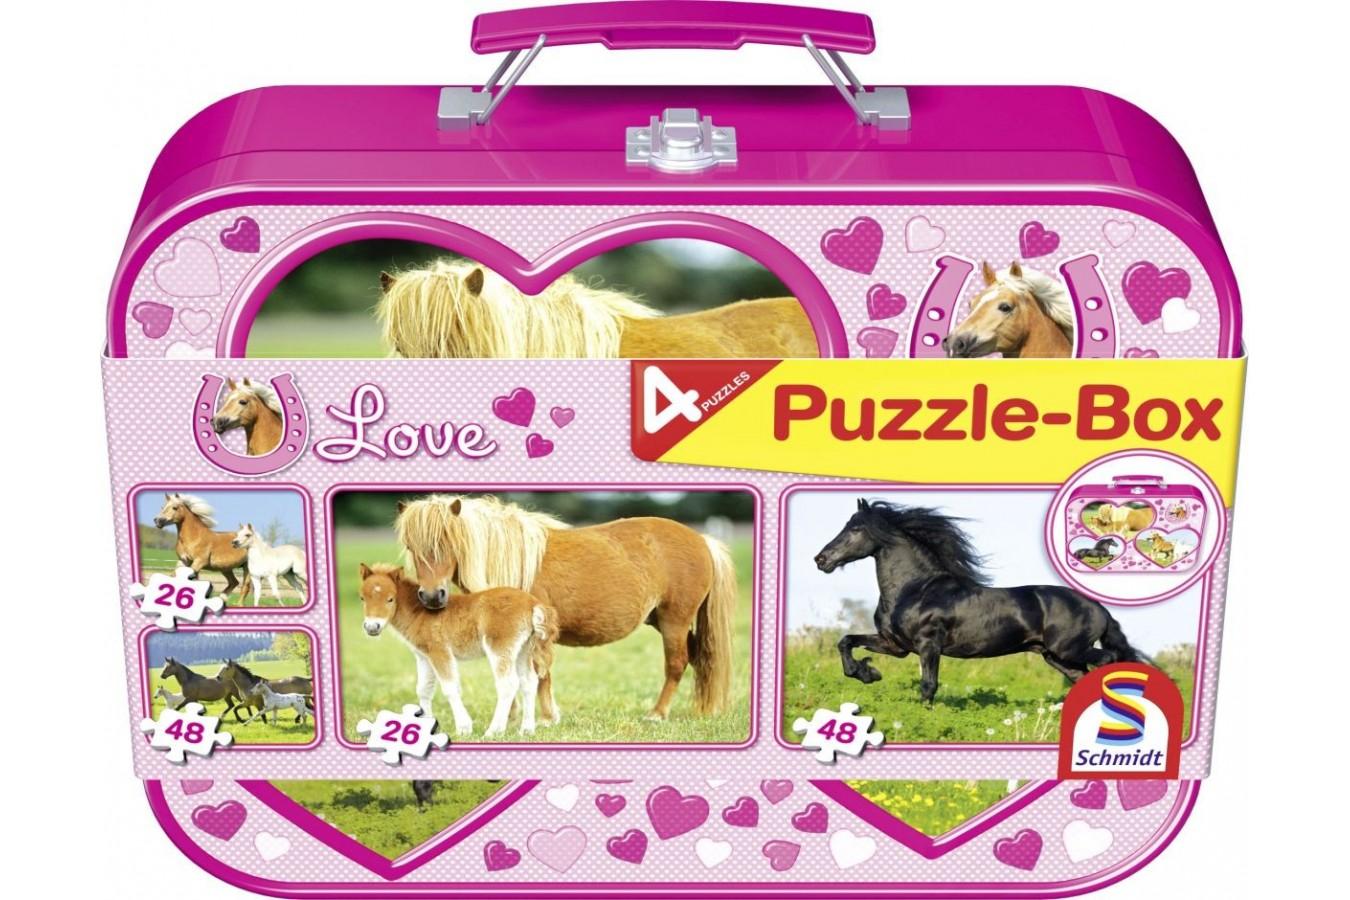 Puzzle Schmidt - Cai, 2x26 + 2x48 piese, cutie metalica (55588) - 1